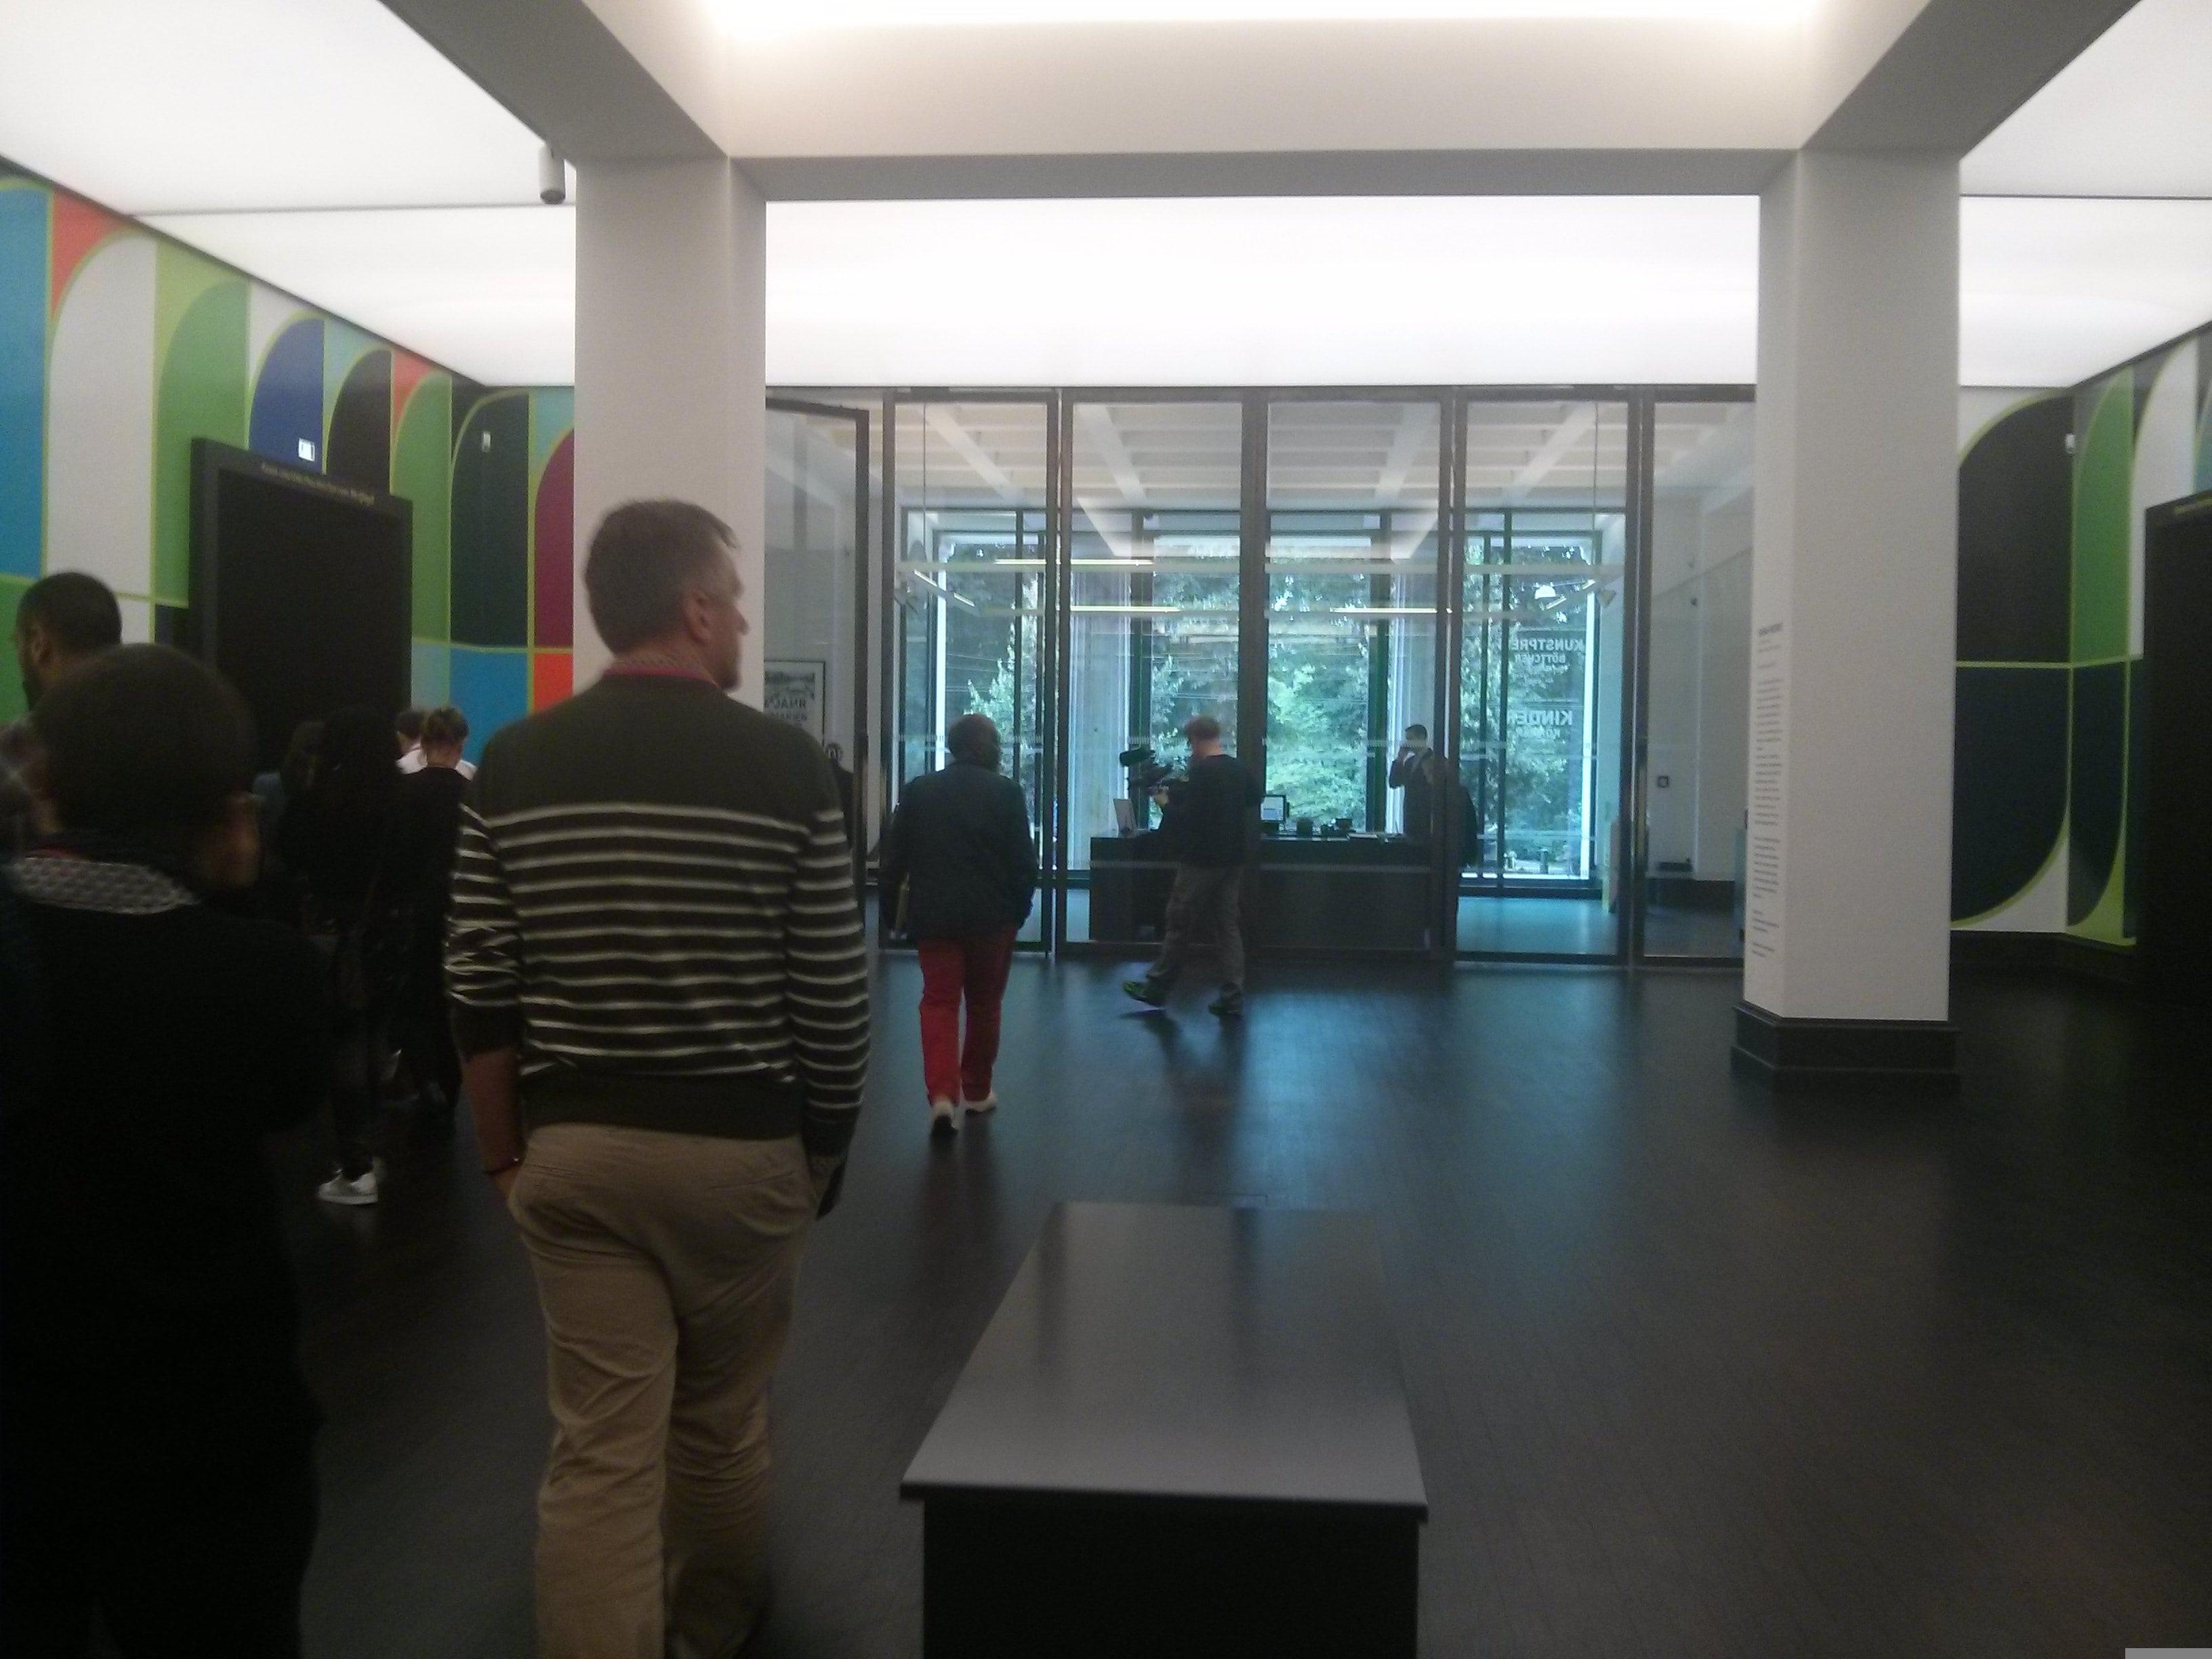 historisches museum frankfurt: Rio de Janeiro inspired Bremen Kunsthalle hall colors